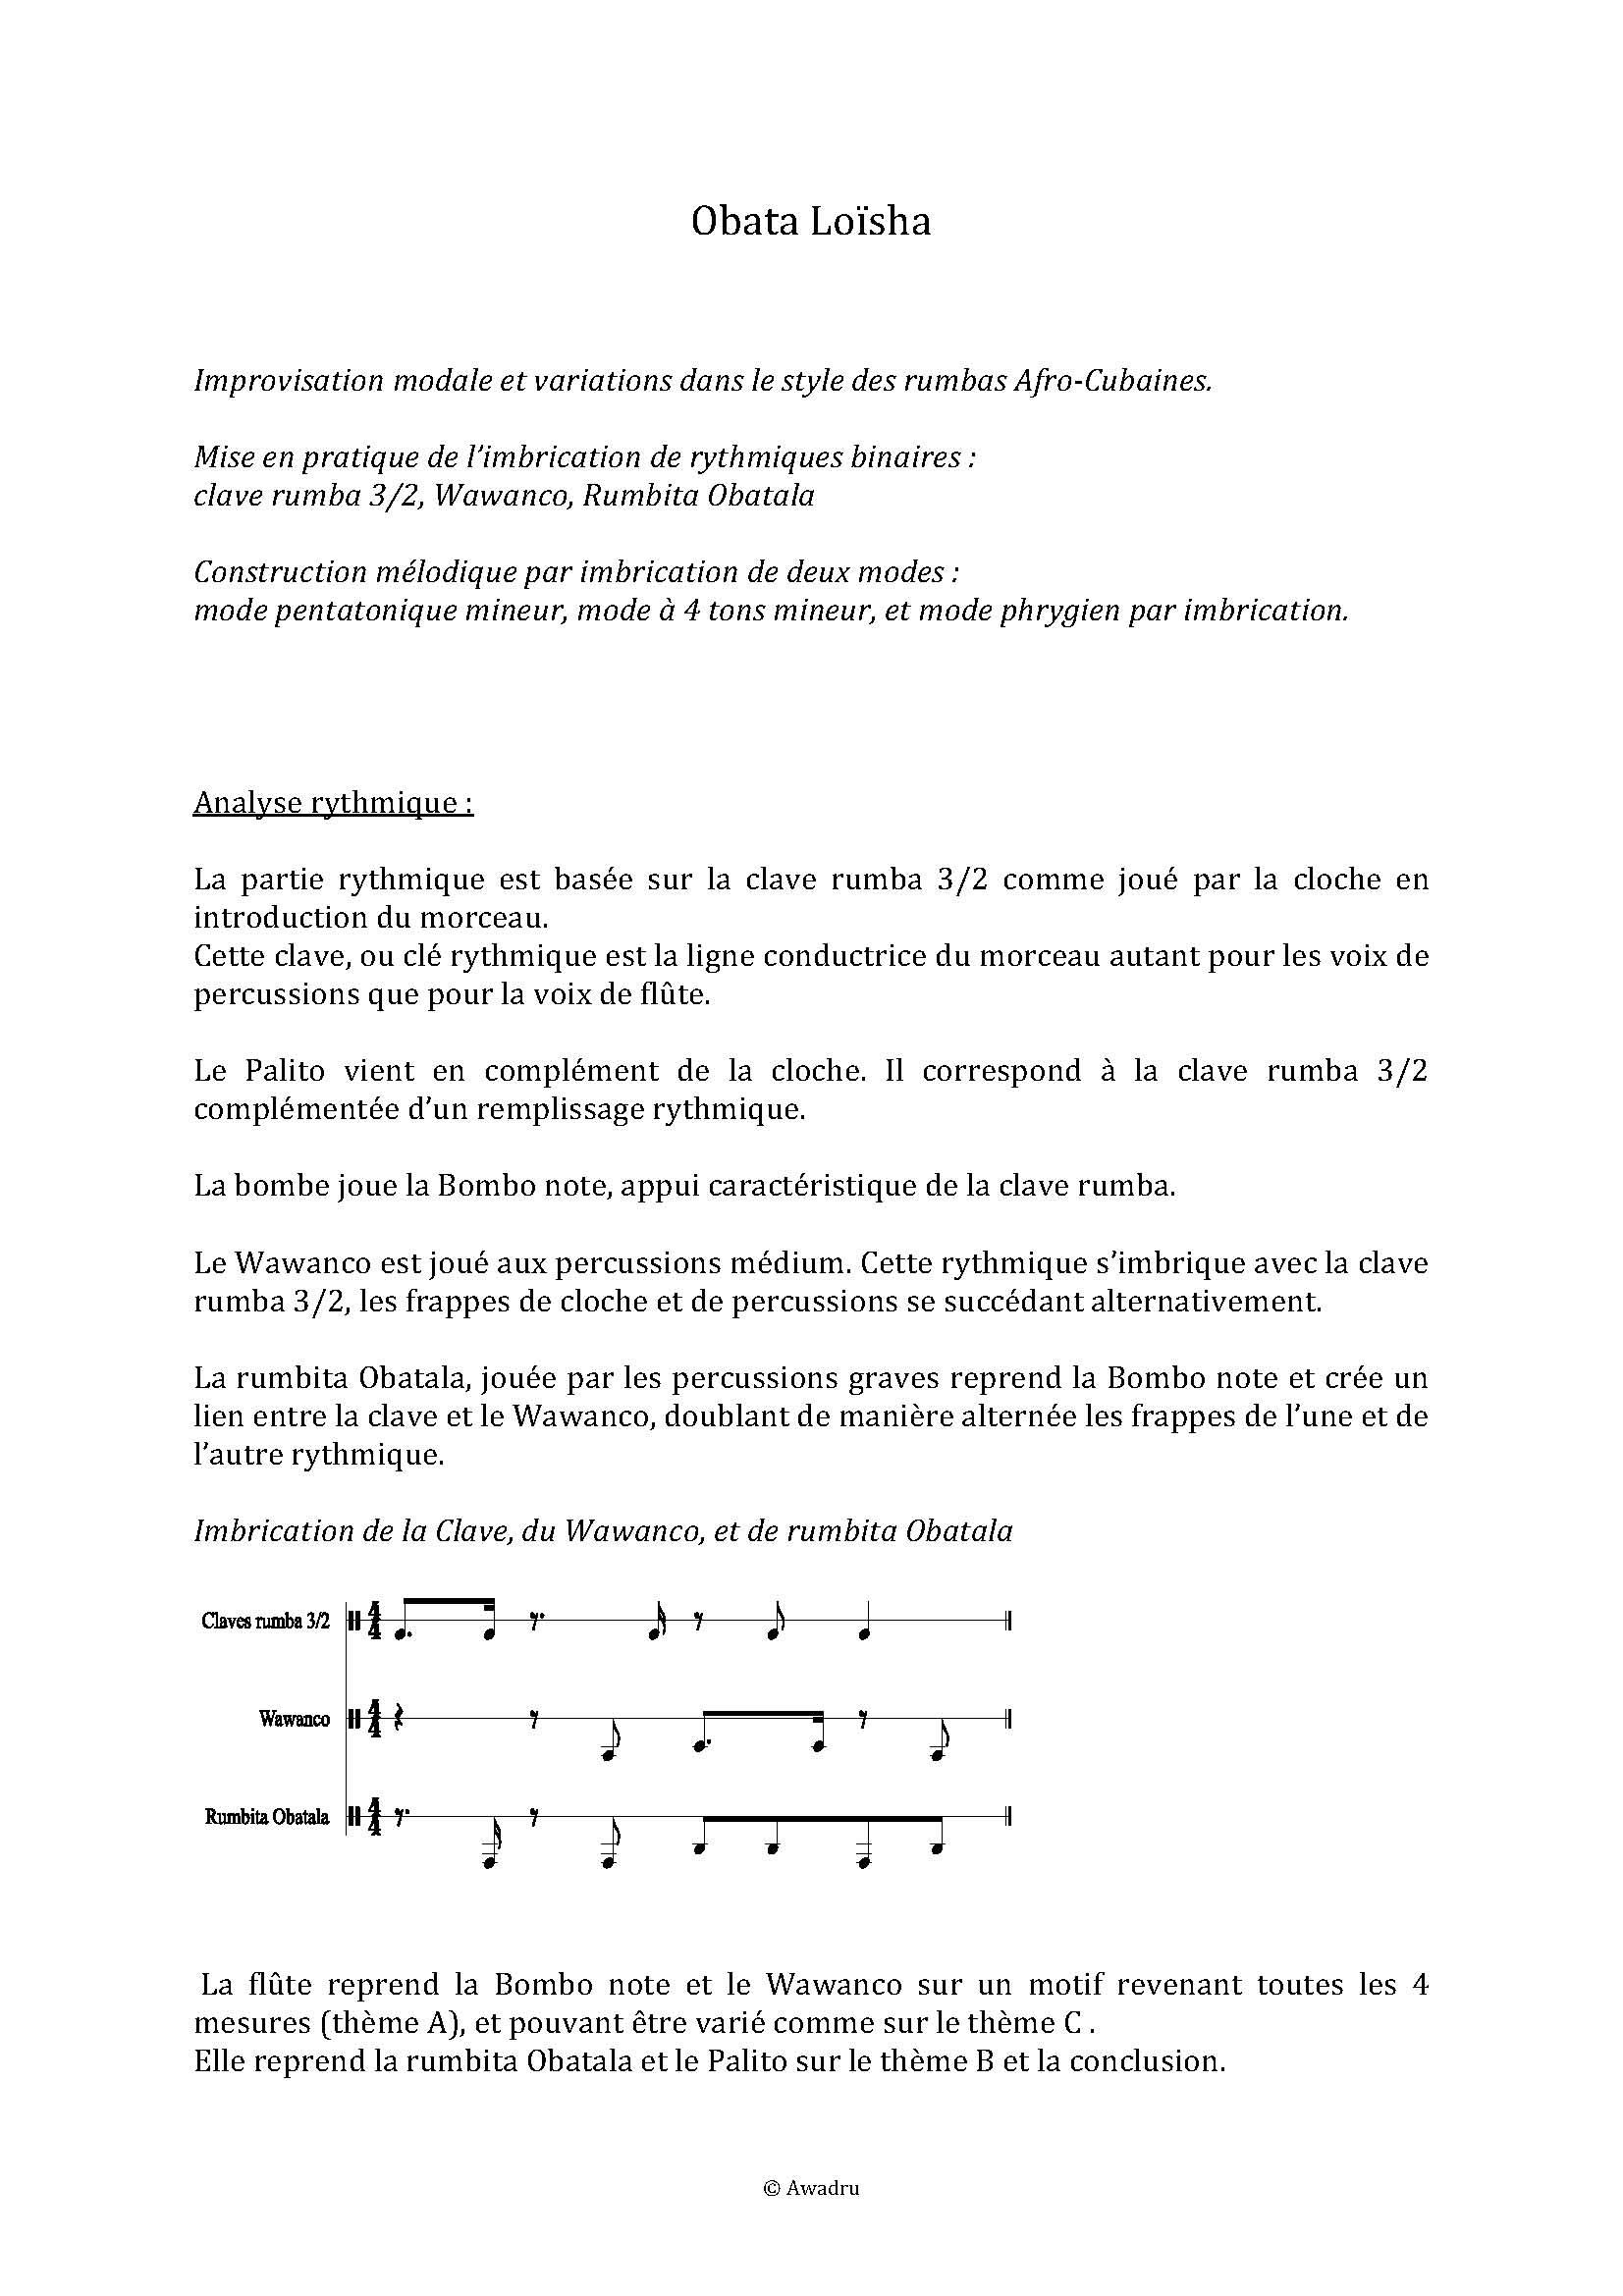 Obata Loïsha - Quatuor Flûte Percussions - LEDROIT F. - Educationnal sheet